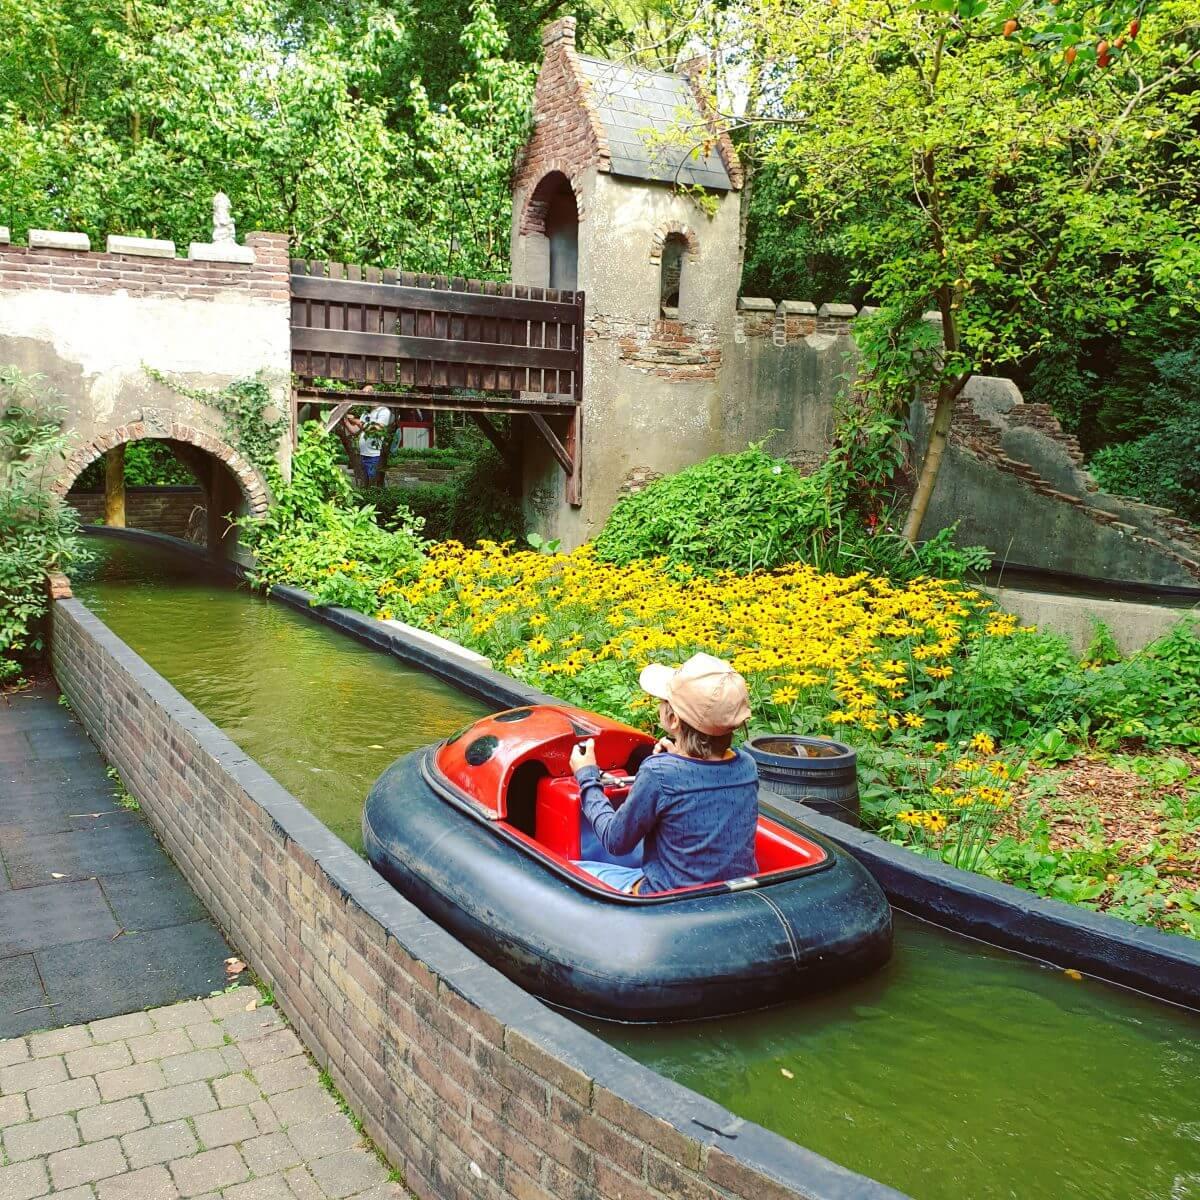 Dobberbootjes in Sprookjeswonderland